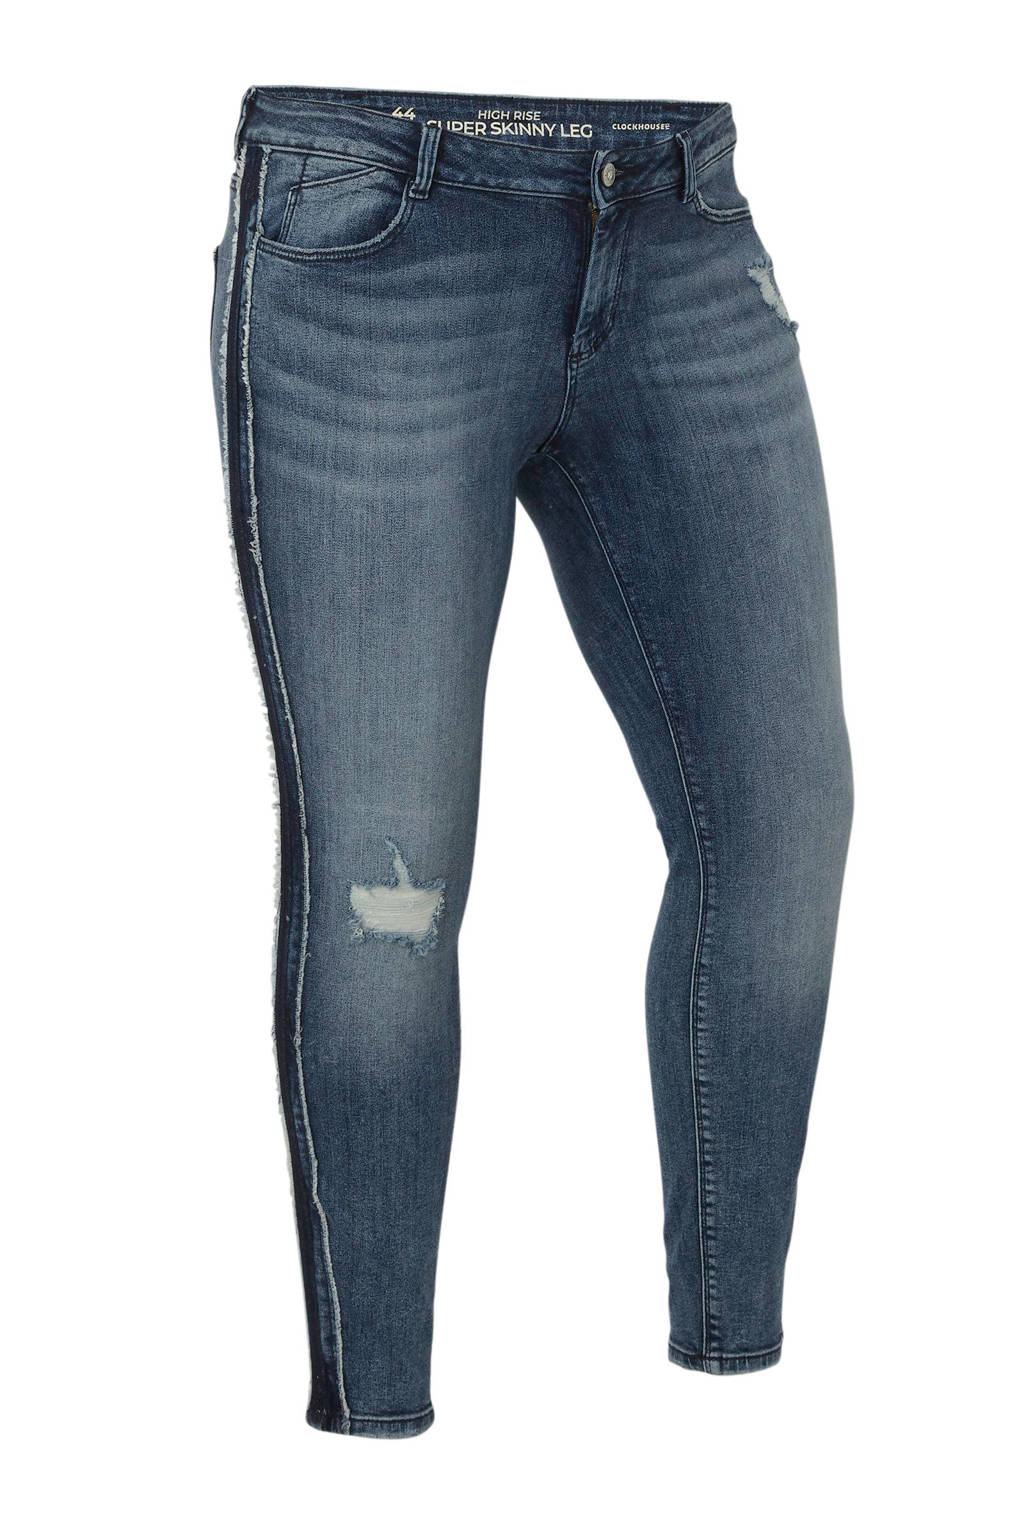 C&A XL Clockhouse high waist skinny jeans met zijstreep en slijtage, Stonewashed